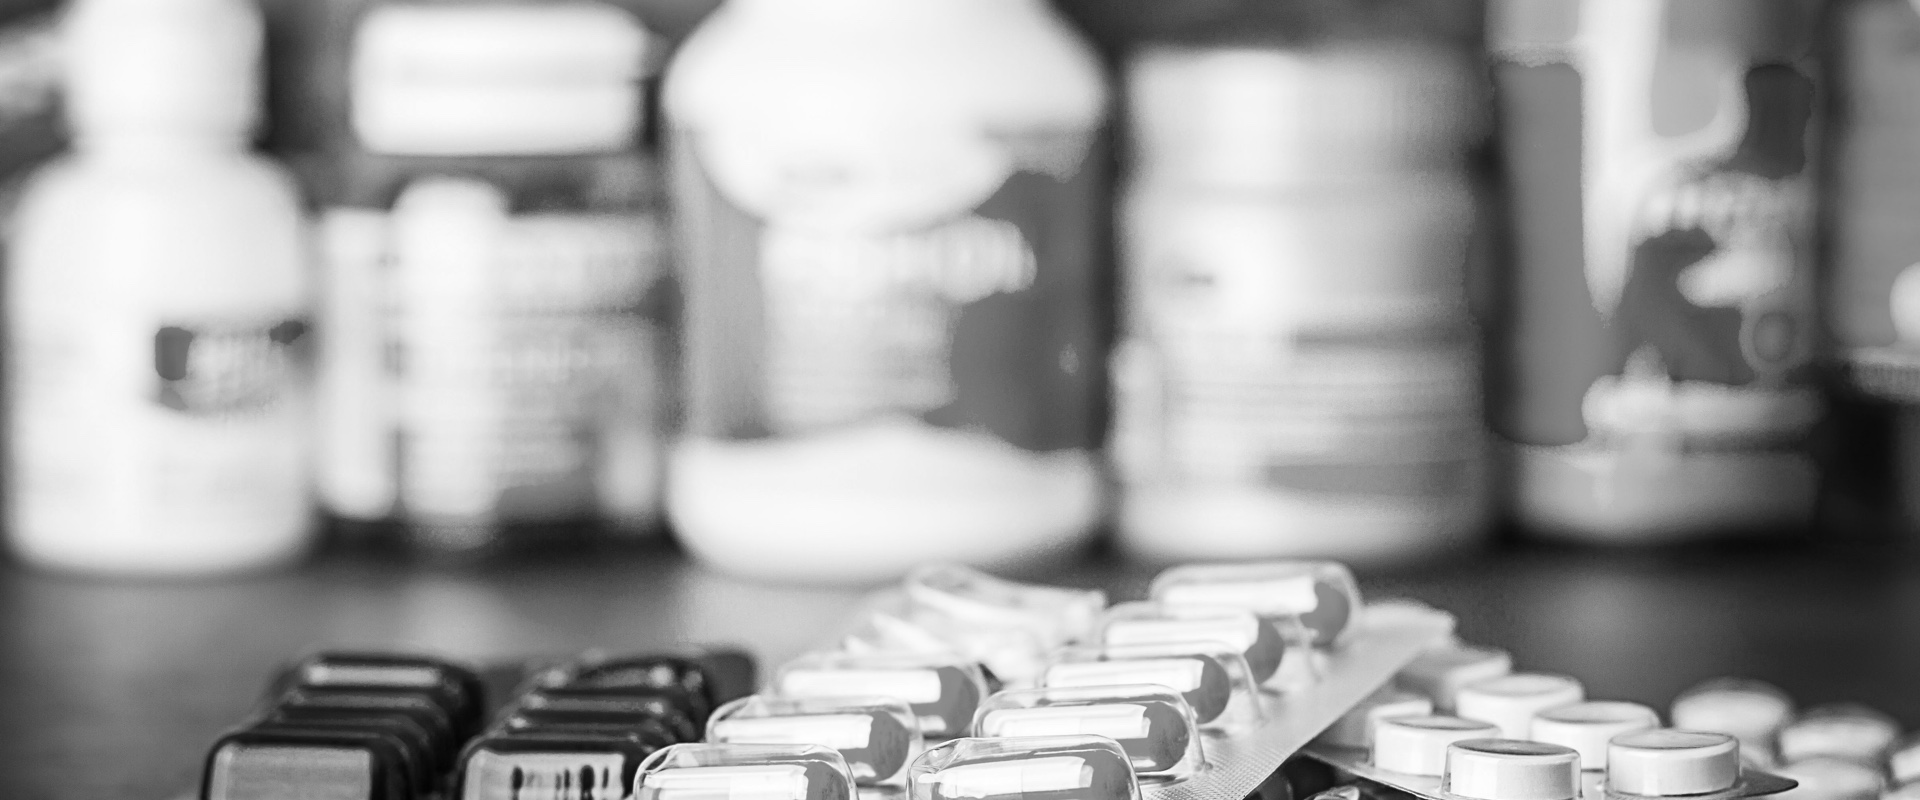 pills on counter